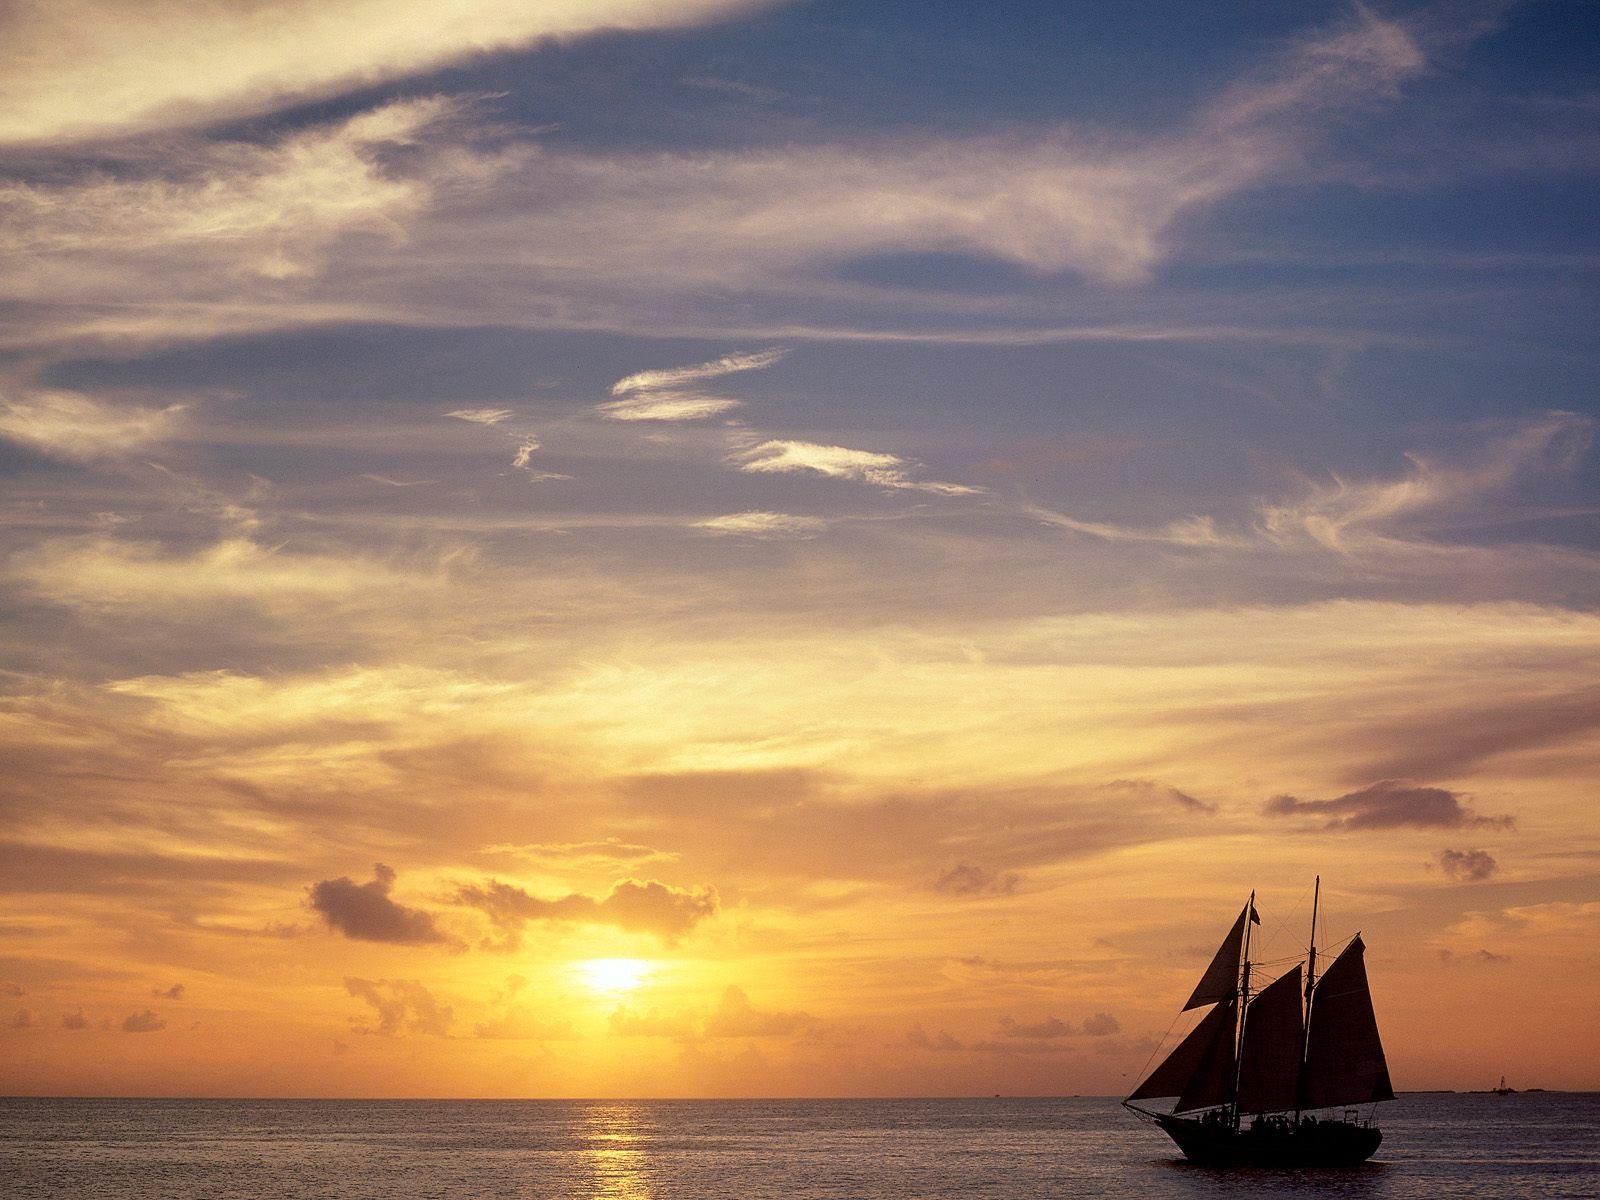 http://3.bp.blogspot.com/-eGjAdd9K4mQ/UB_--lSapOI/AAAAAAAAAR0/QjQ5nE5kuBI/s1600/Key+West,+Florida.jpg